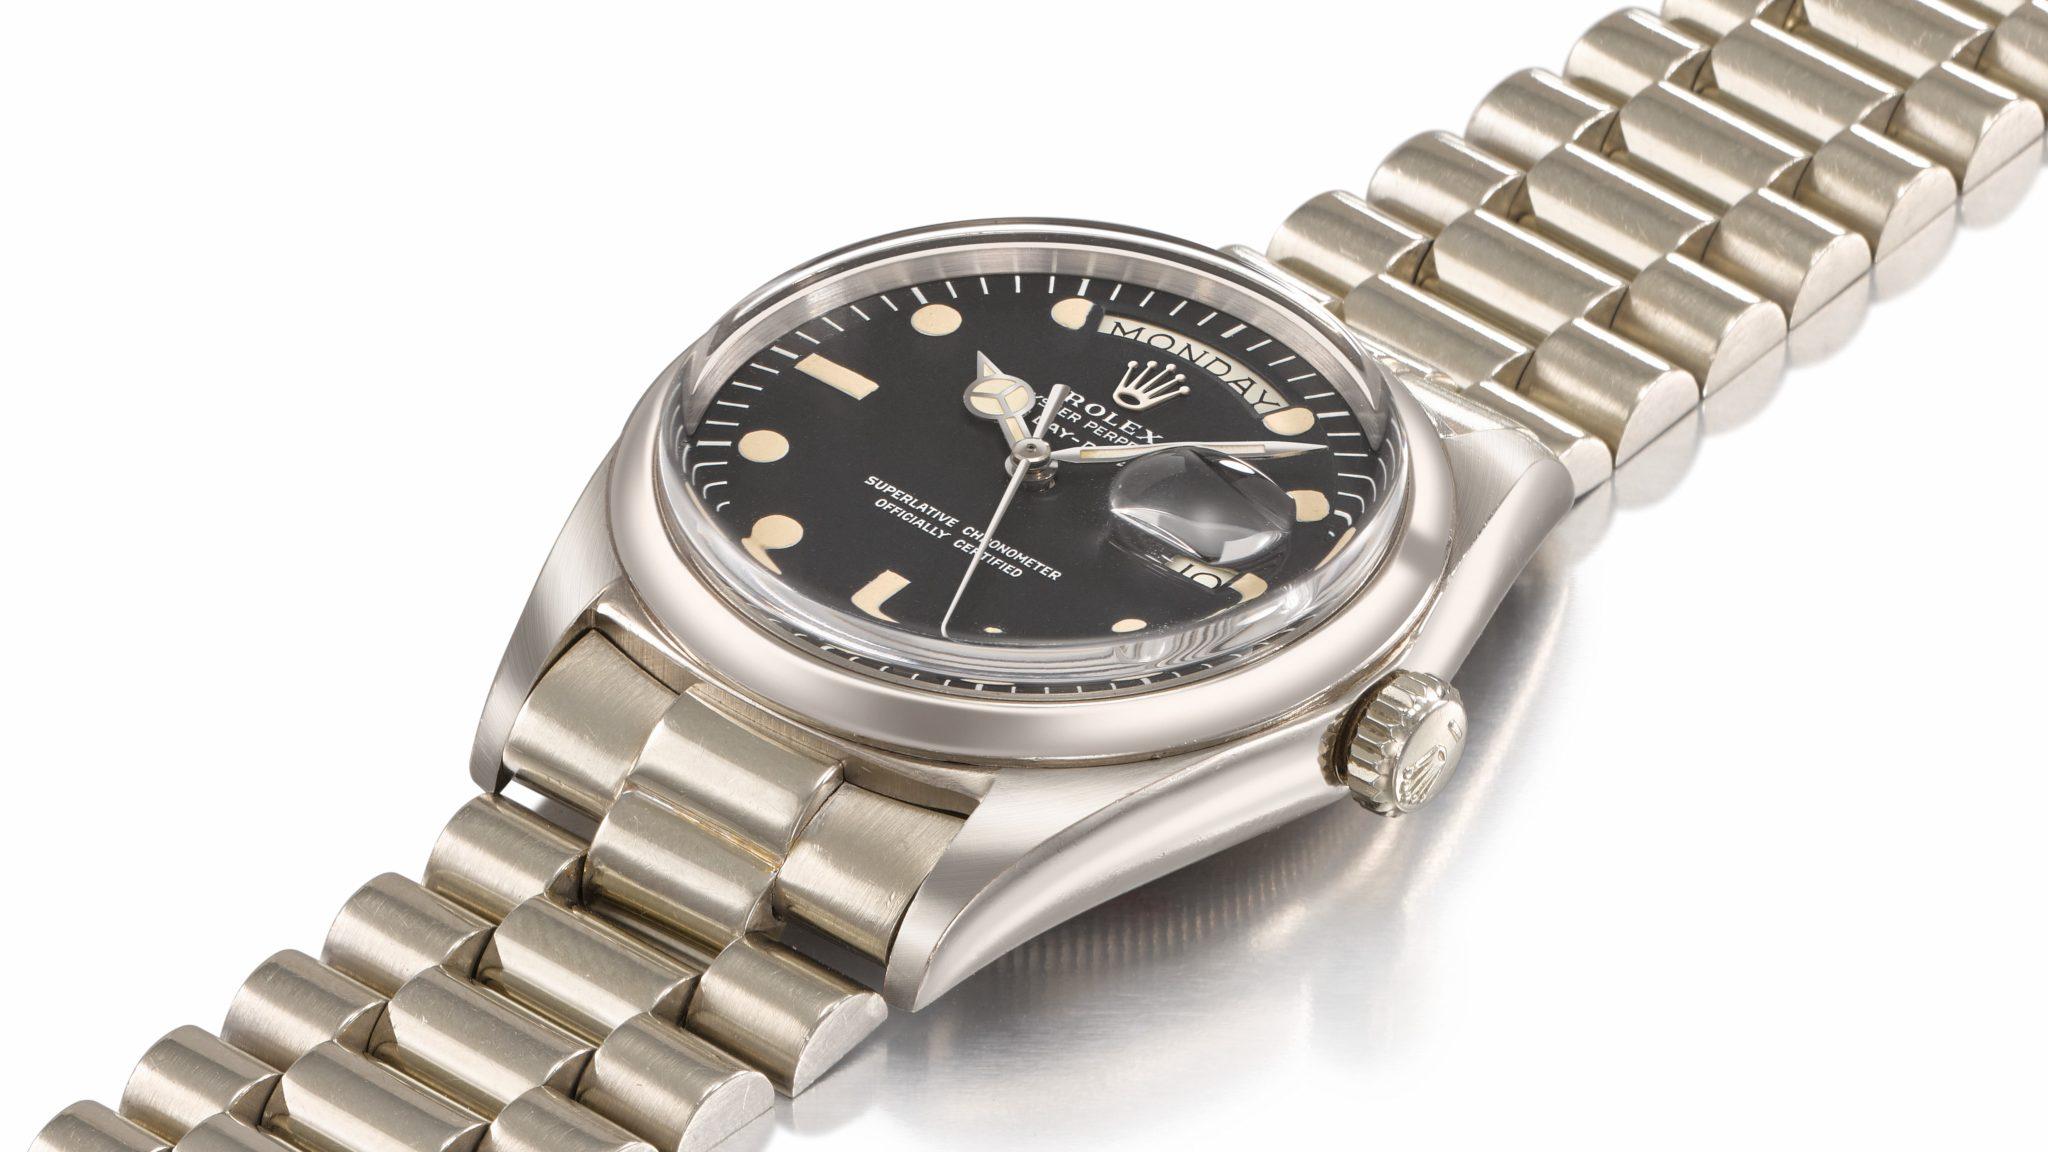 vintage-datejust-precision-watches